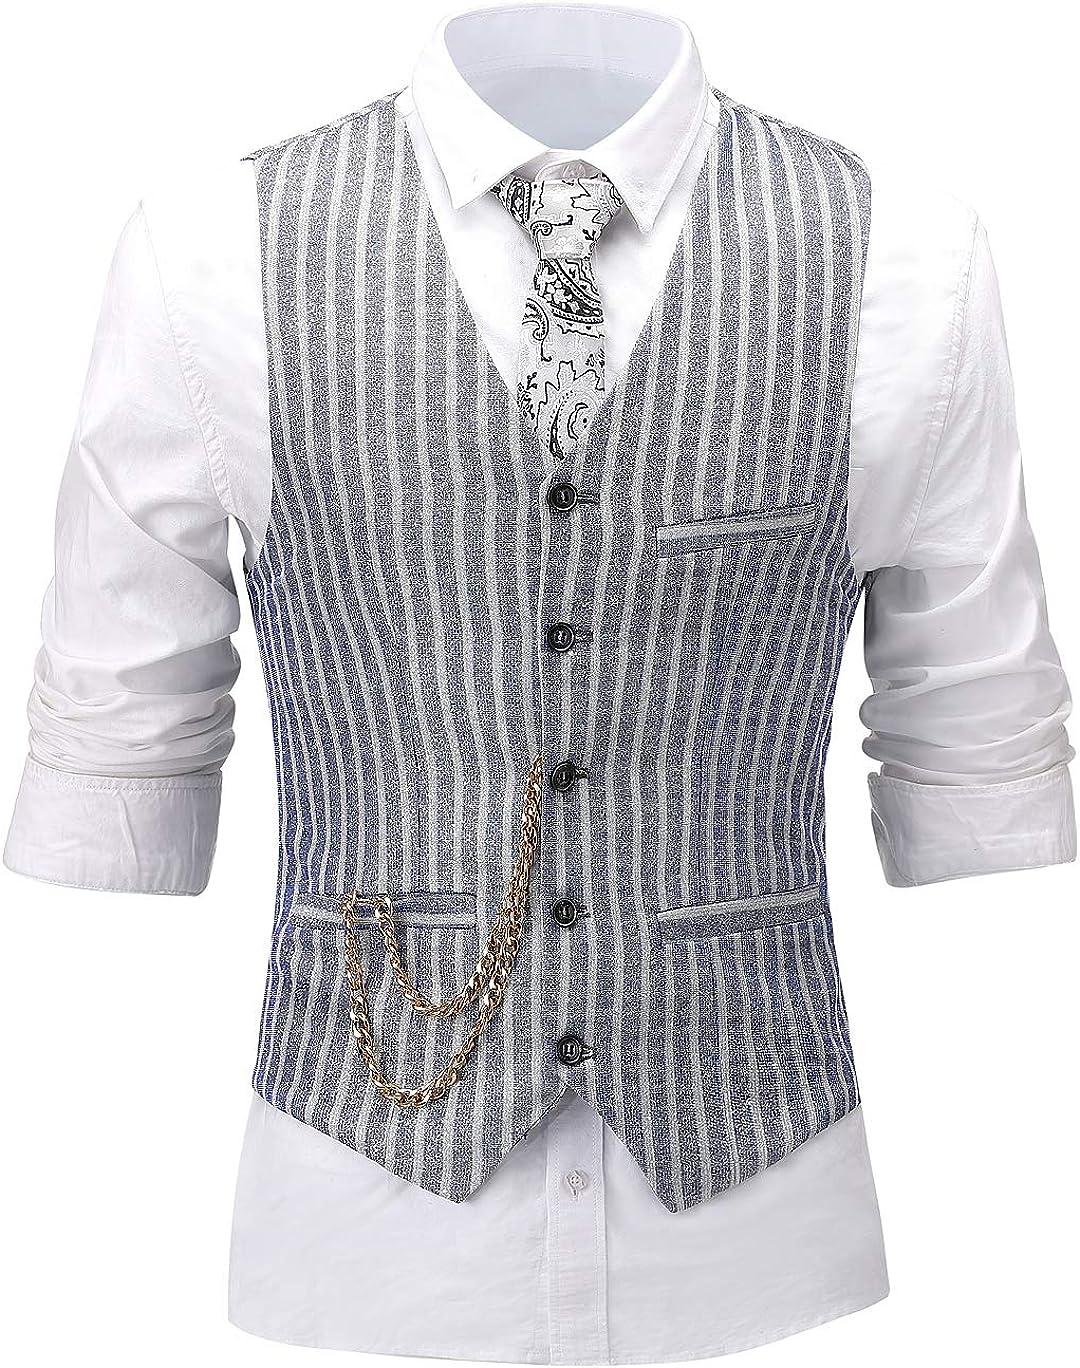 Men's 3 Pieces Formal Solid Mens Suit Slim Fit Printed Tuxedos for Wedding Groomsmen(Blazer+Vest+Pant)